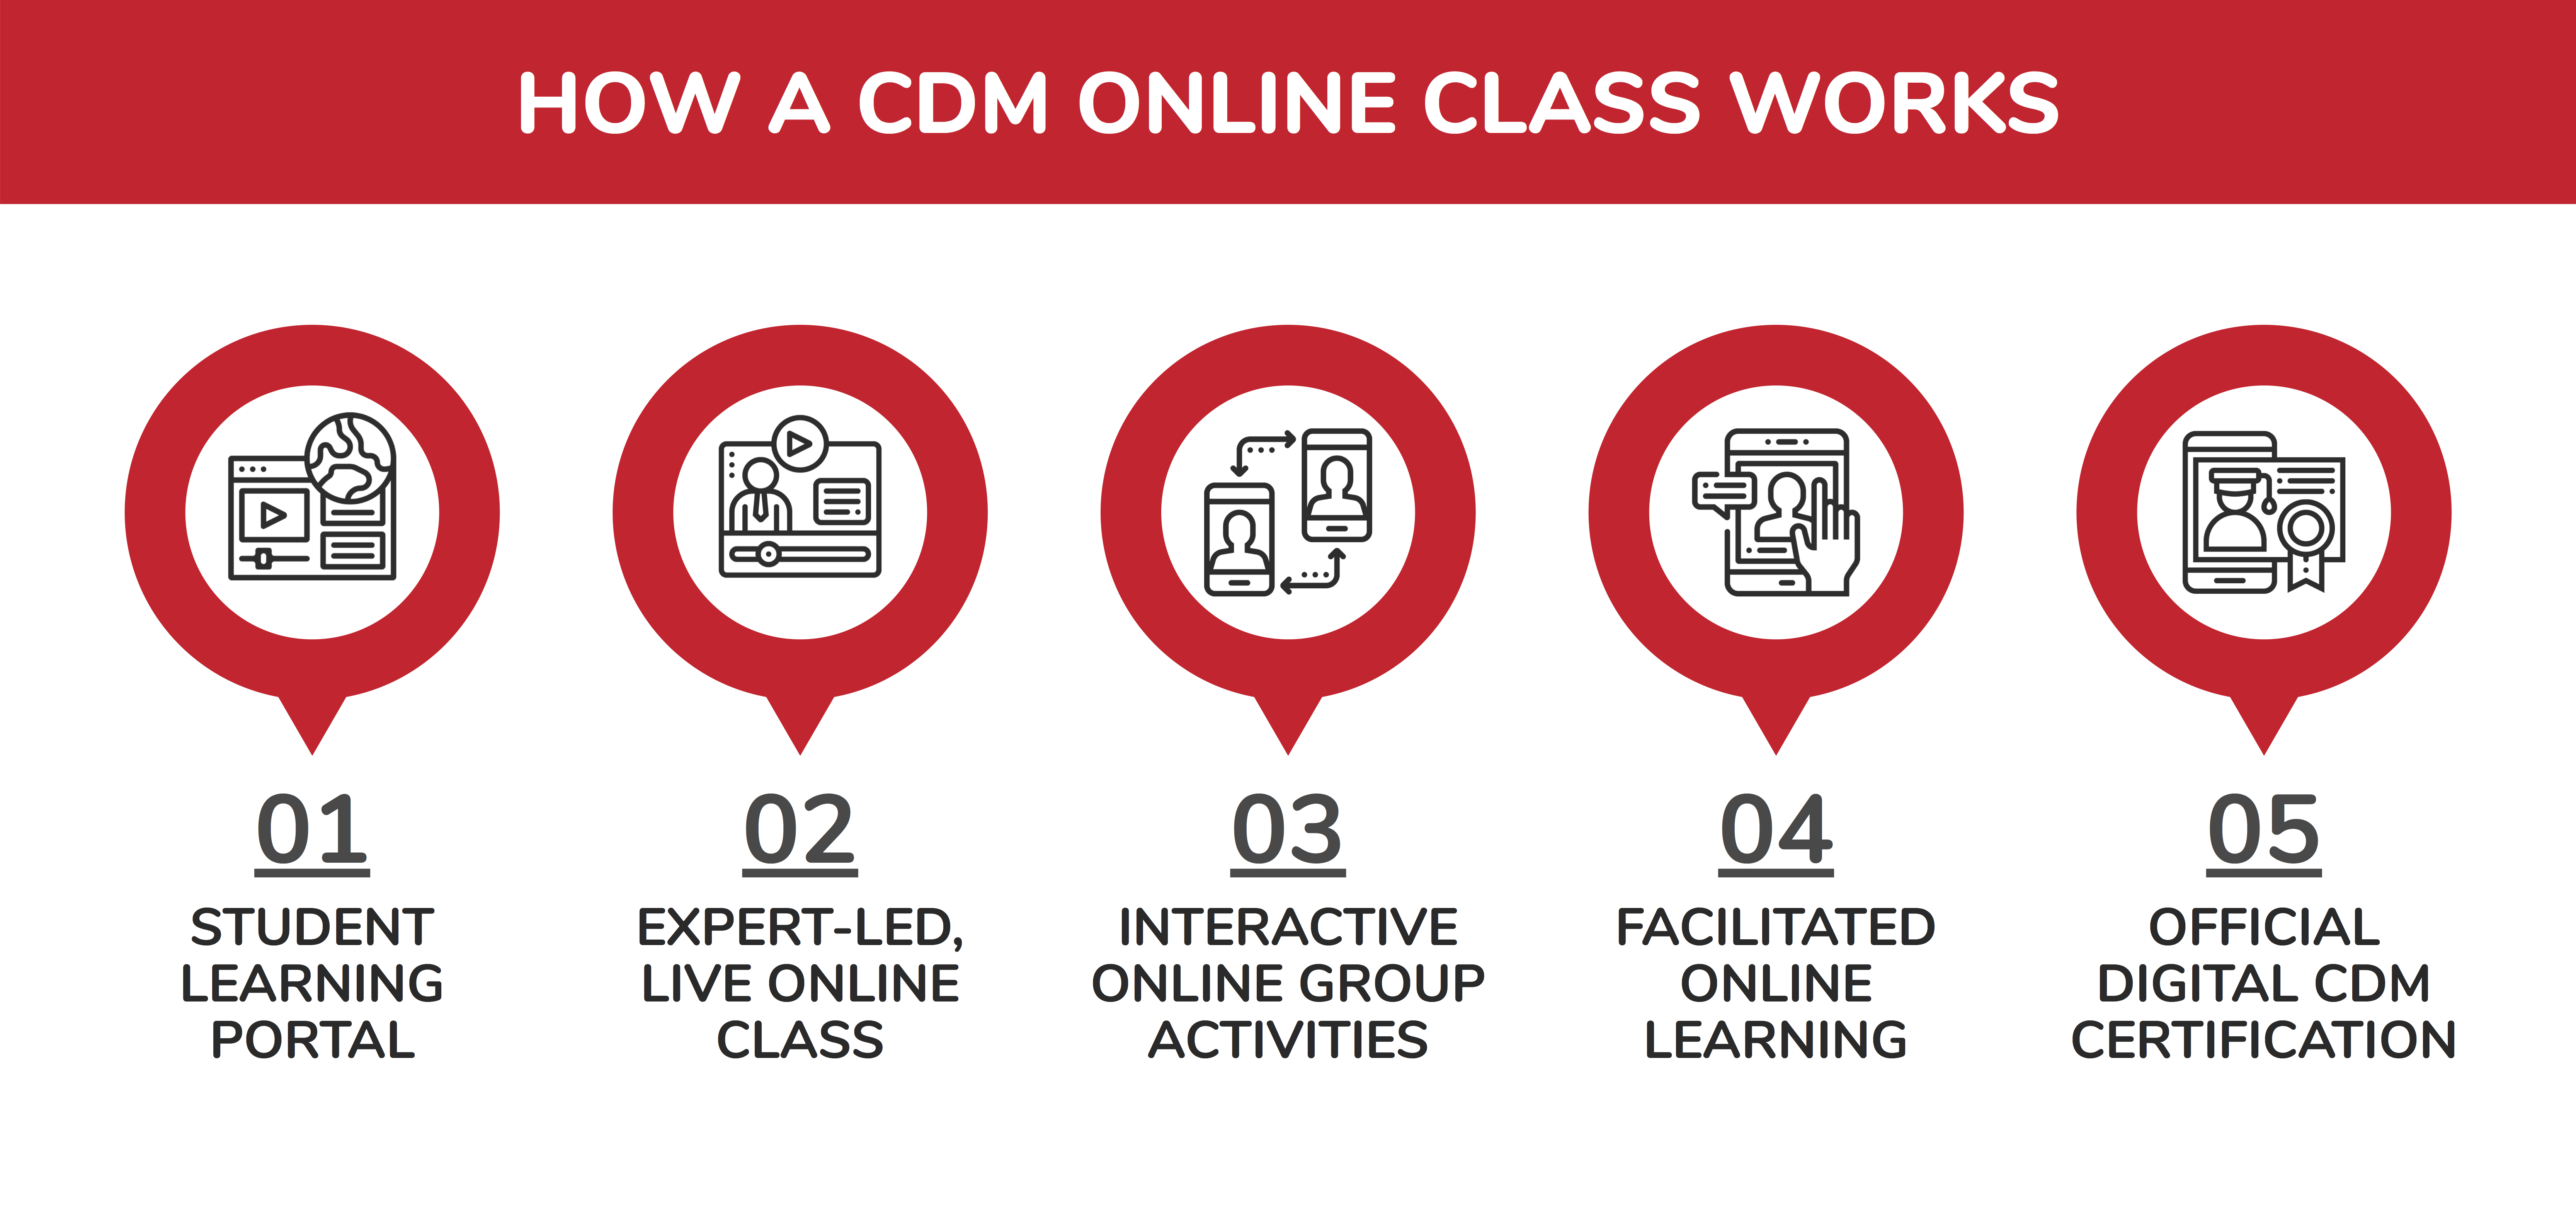 CDM Online Classes Method